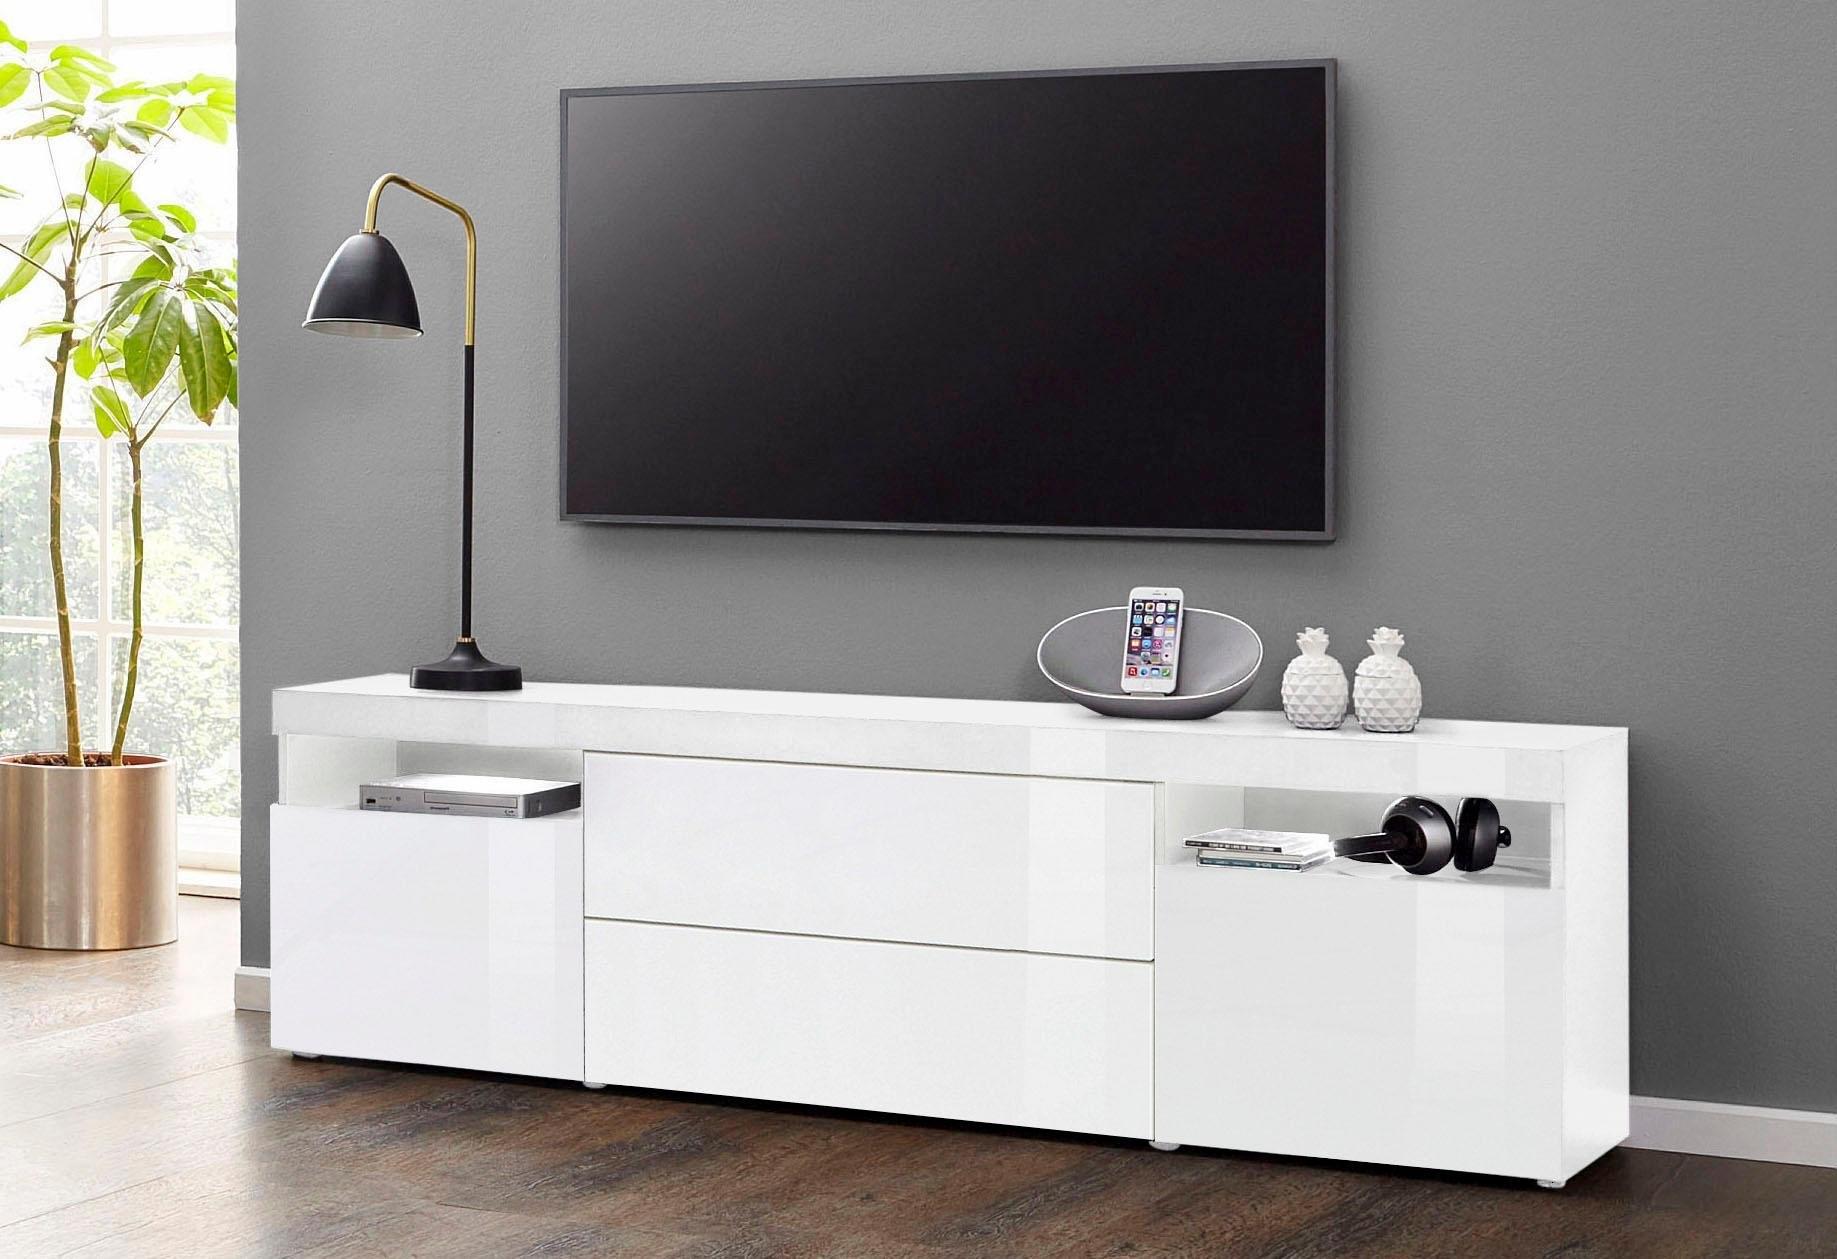 borchardt Möbel tv-meubel Kaapstad Breedte 166 cm nu online bestellen